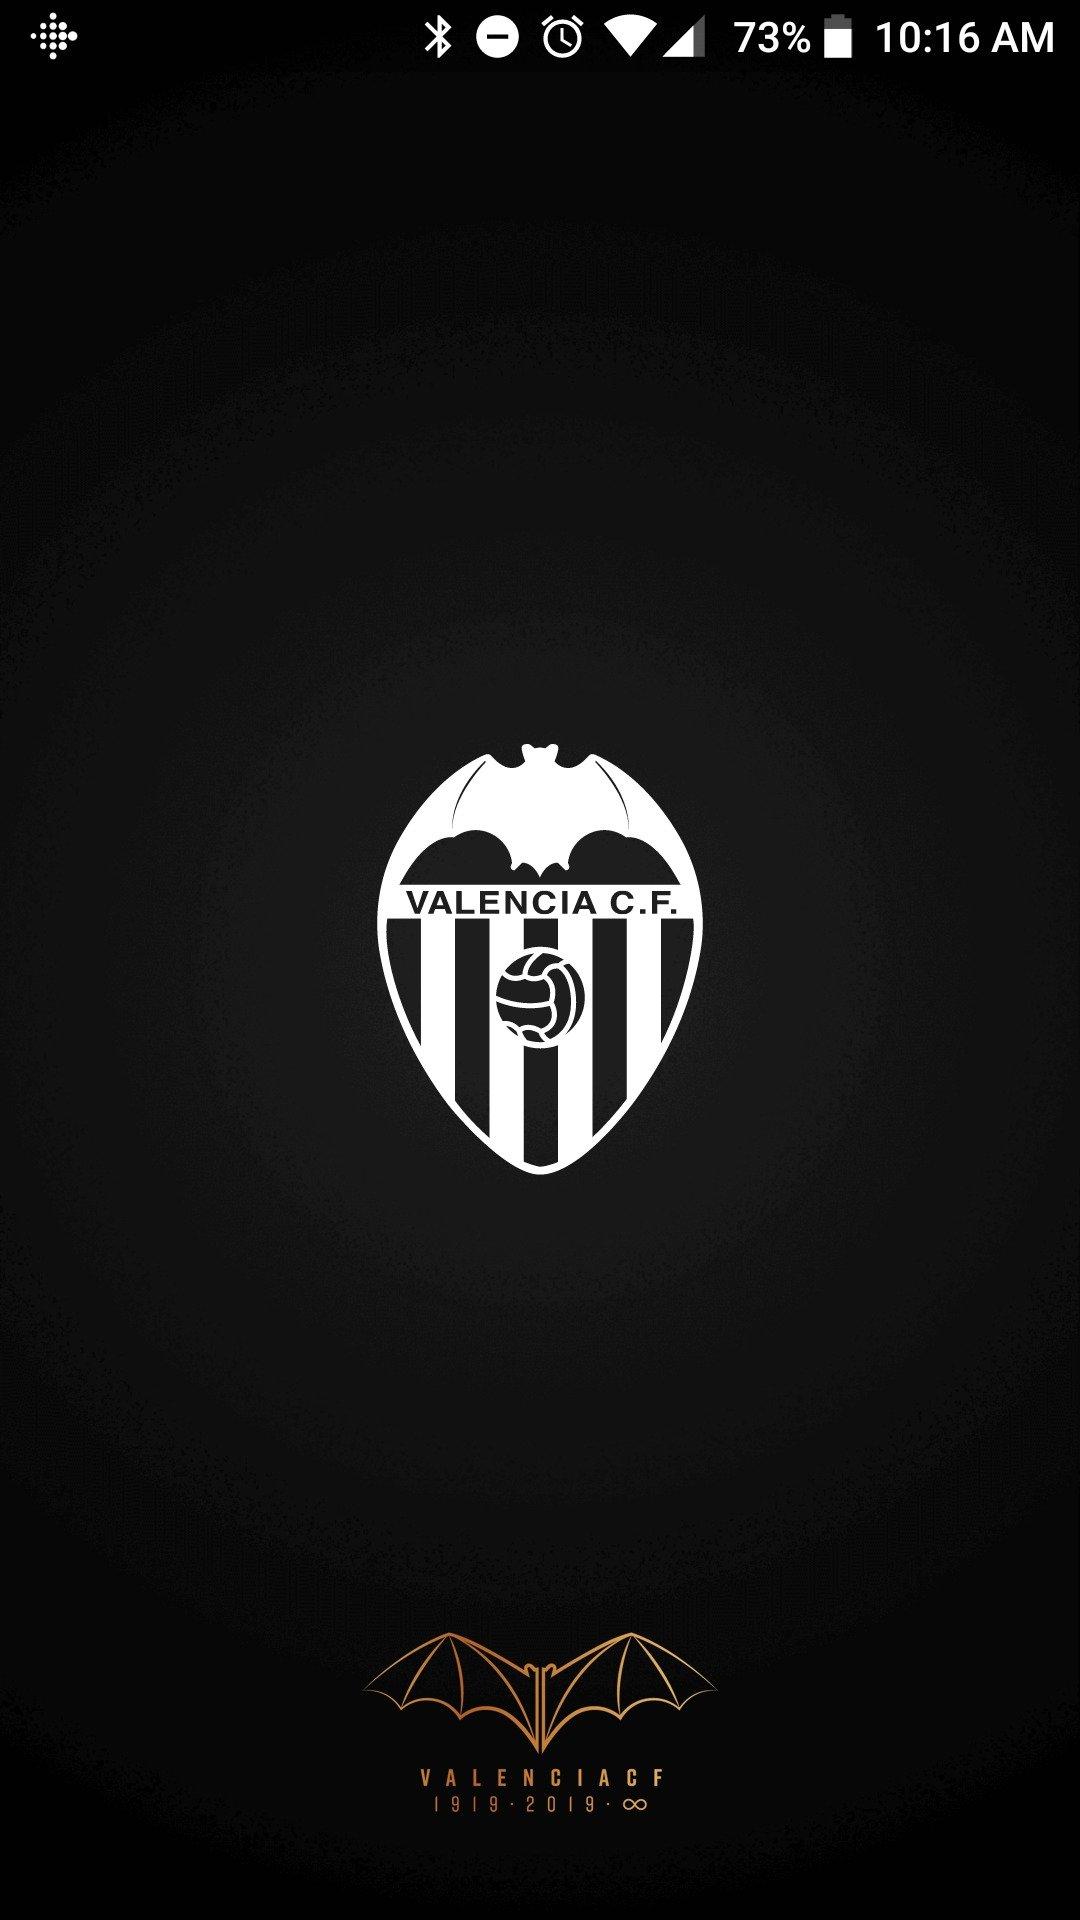 Valencia CF App Android image 4